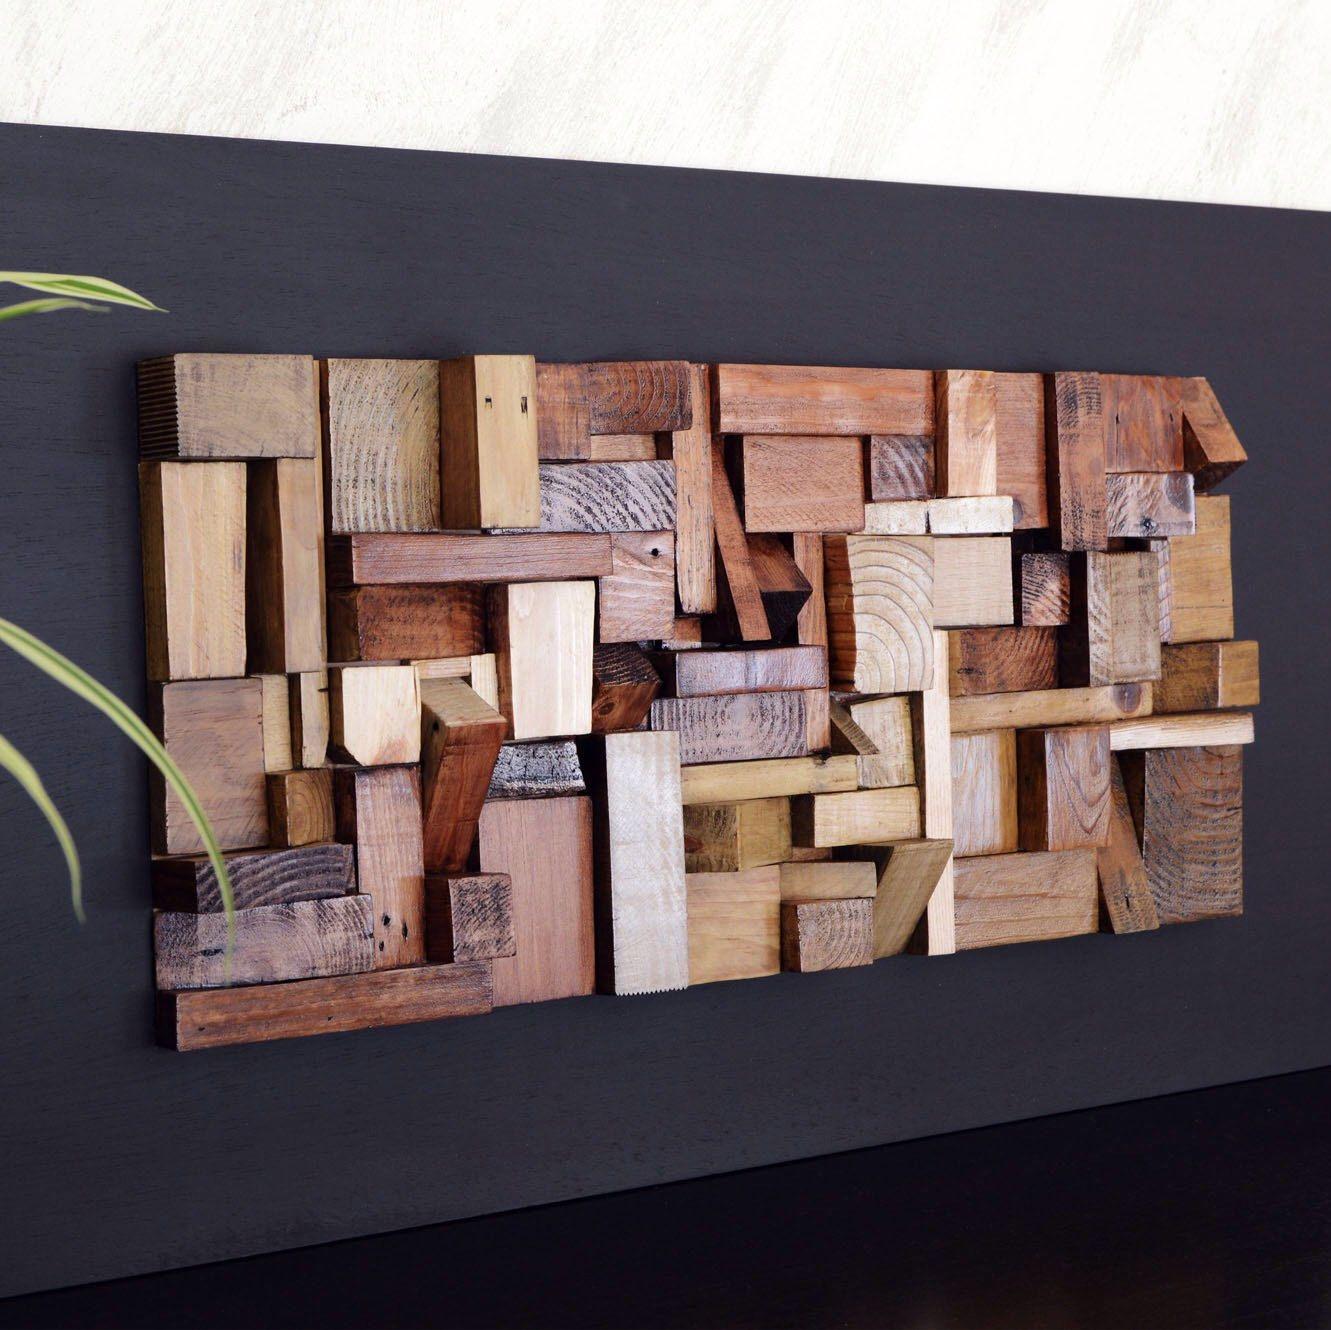 Sculpture wall art reclaimed wood wall art living room decorations